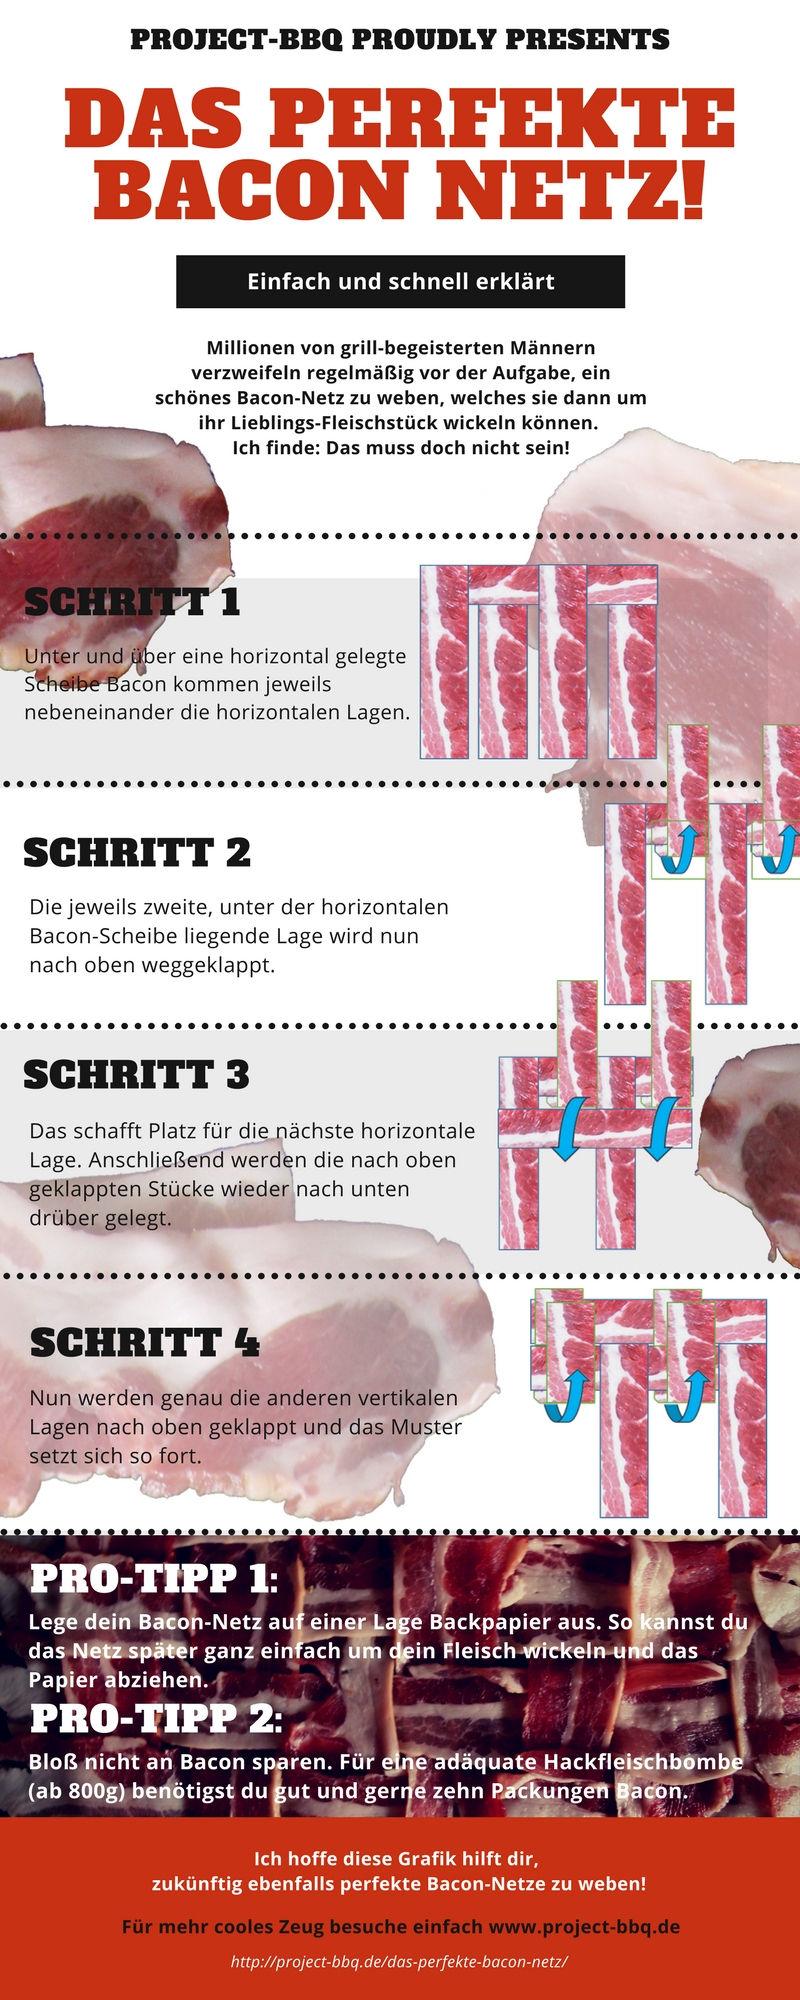 So gelingt dein Bacon Netz ganz easy!